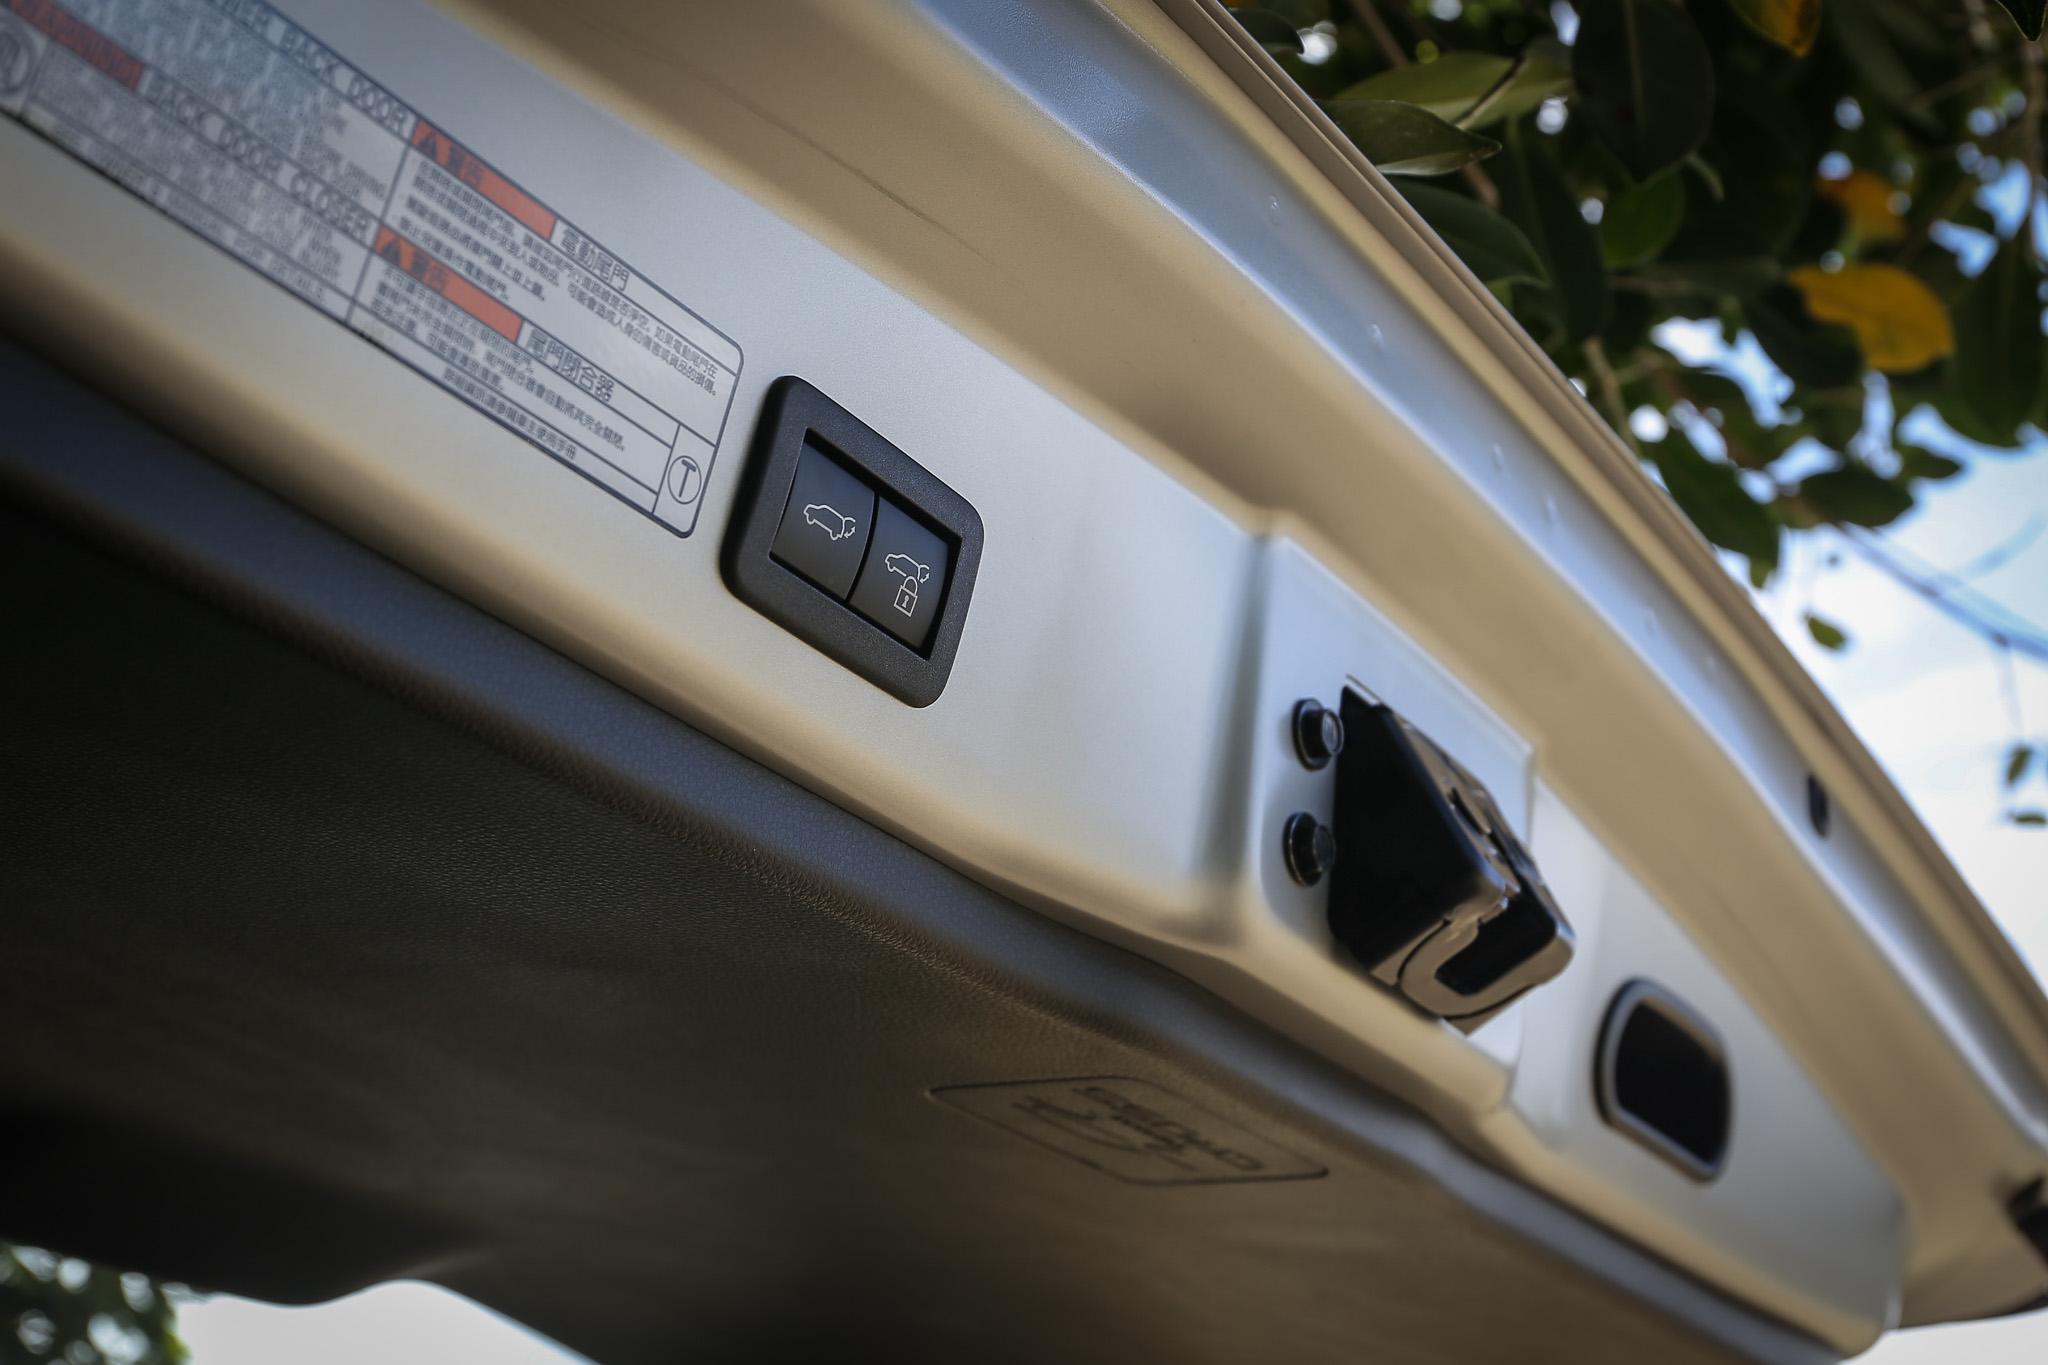 1.8L 油電旗艦款才配備有足踢式感應尾門,其餘車型等級皆為手動操作。